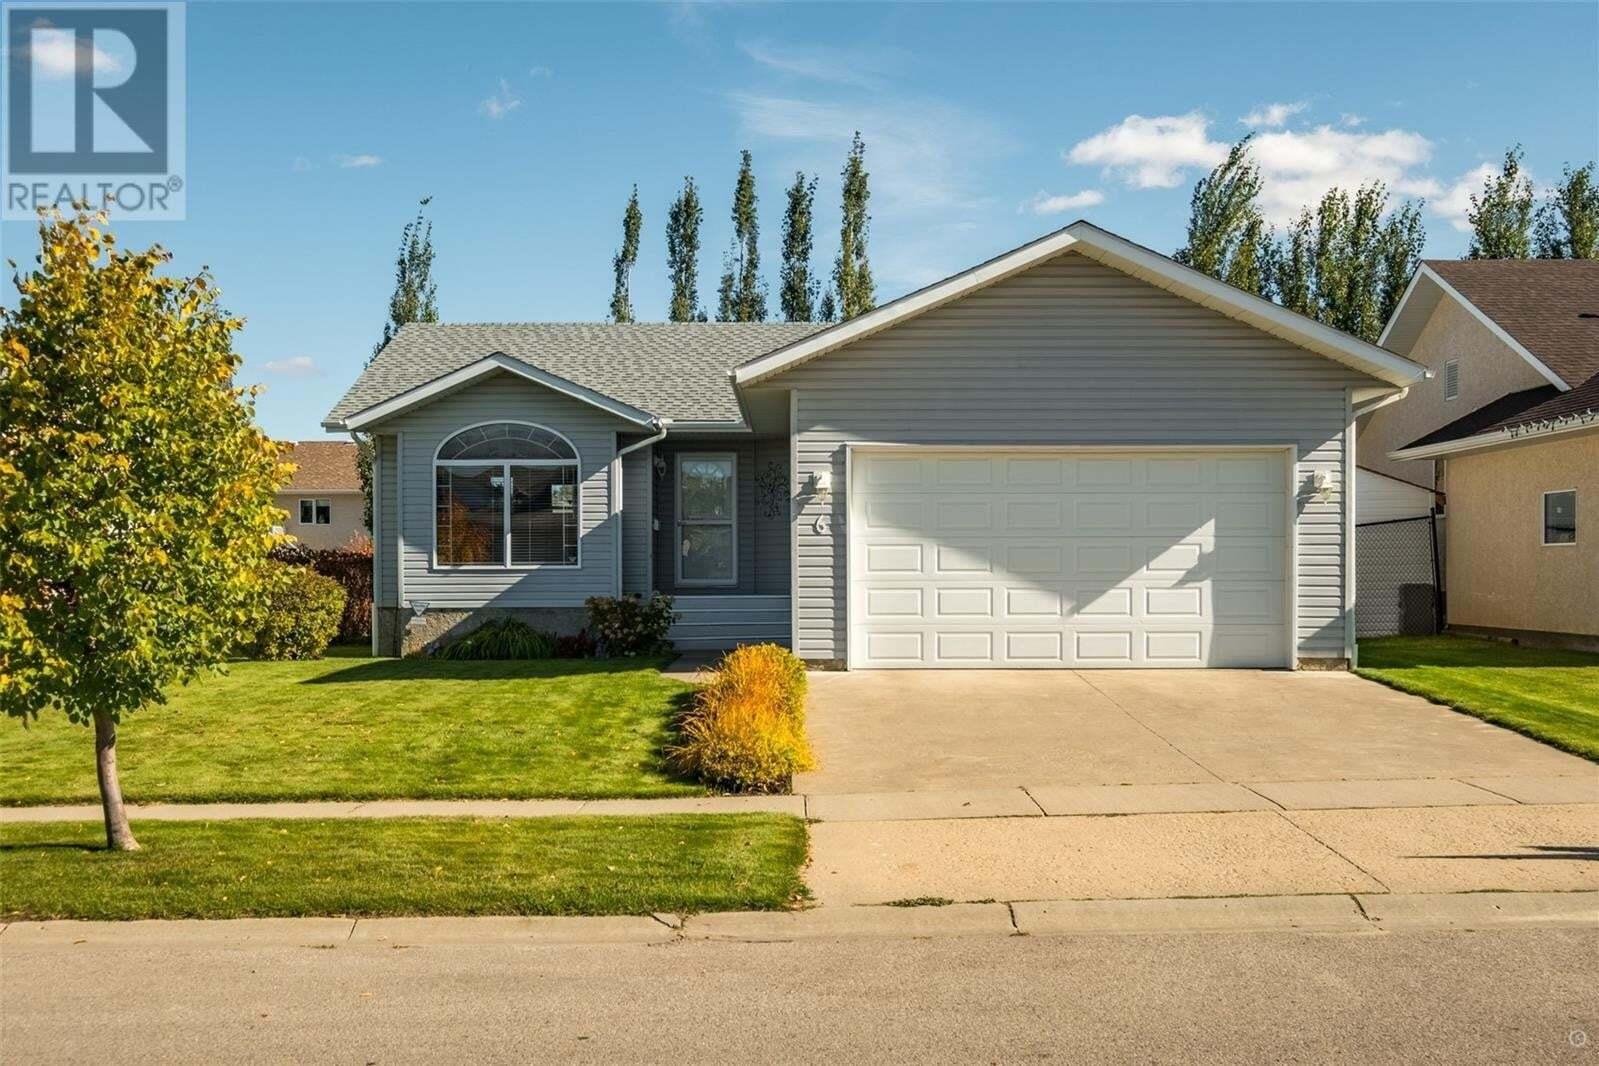 House for sale at 6 Telfer By Prince Albert Saskatchewan - MLS: SK827746